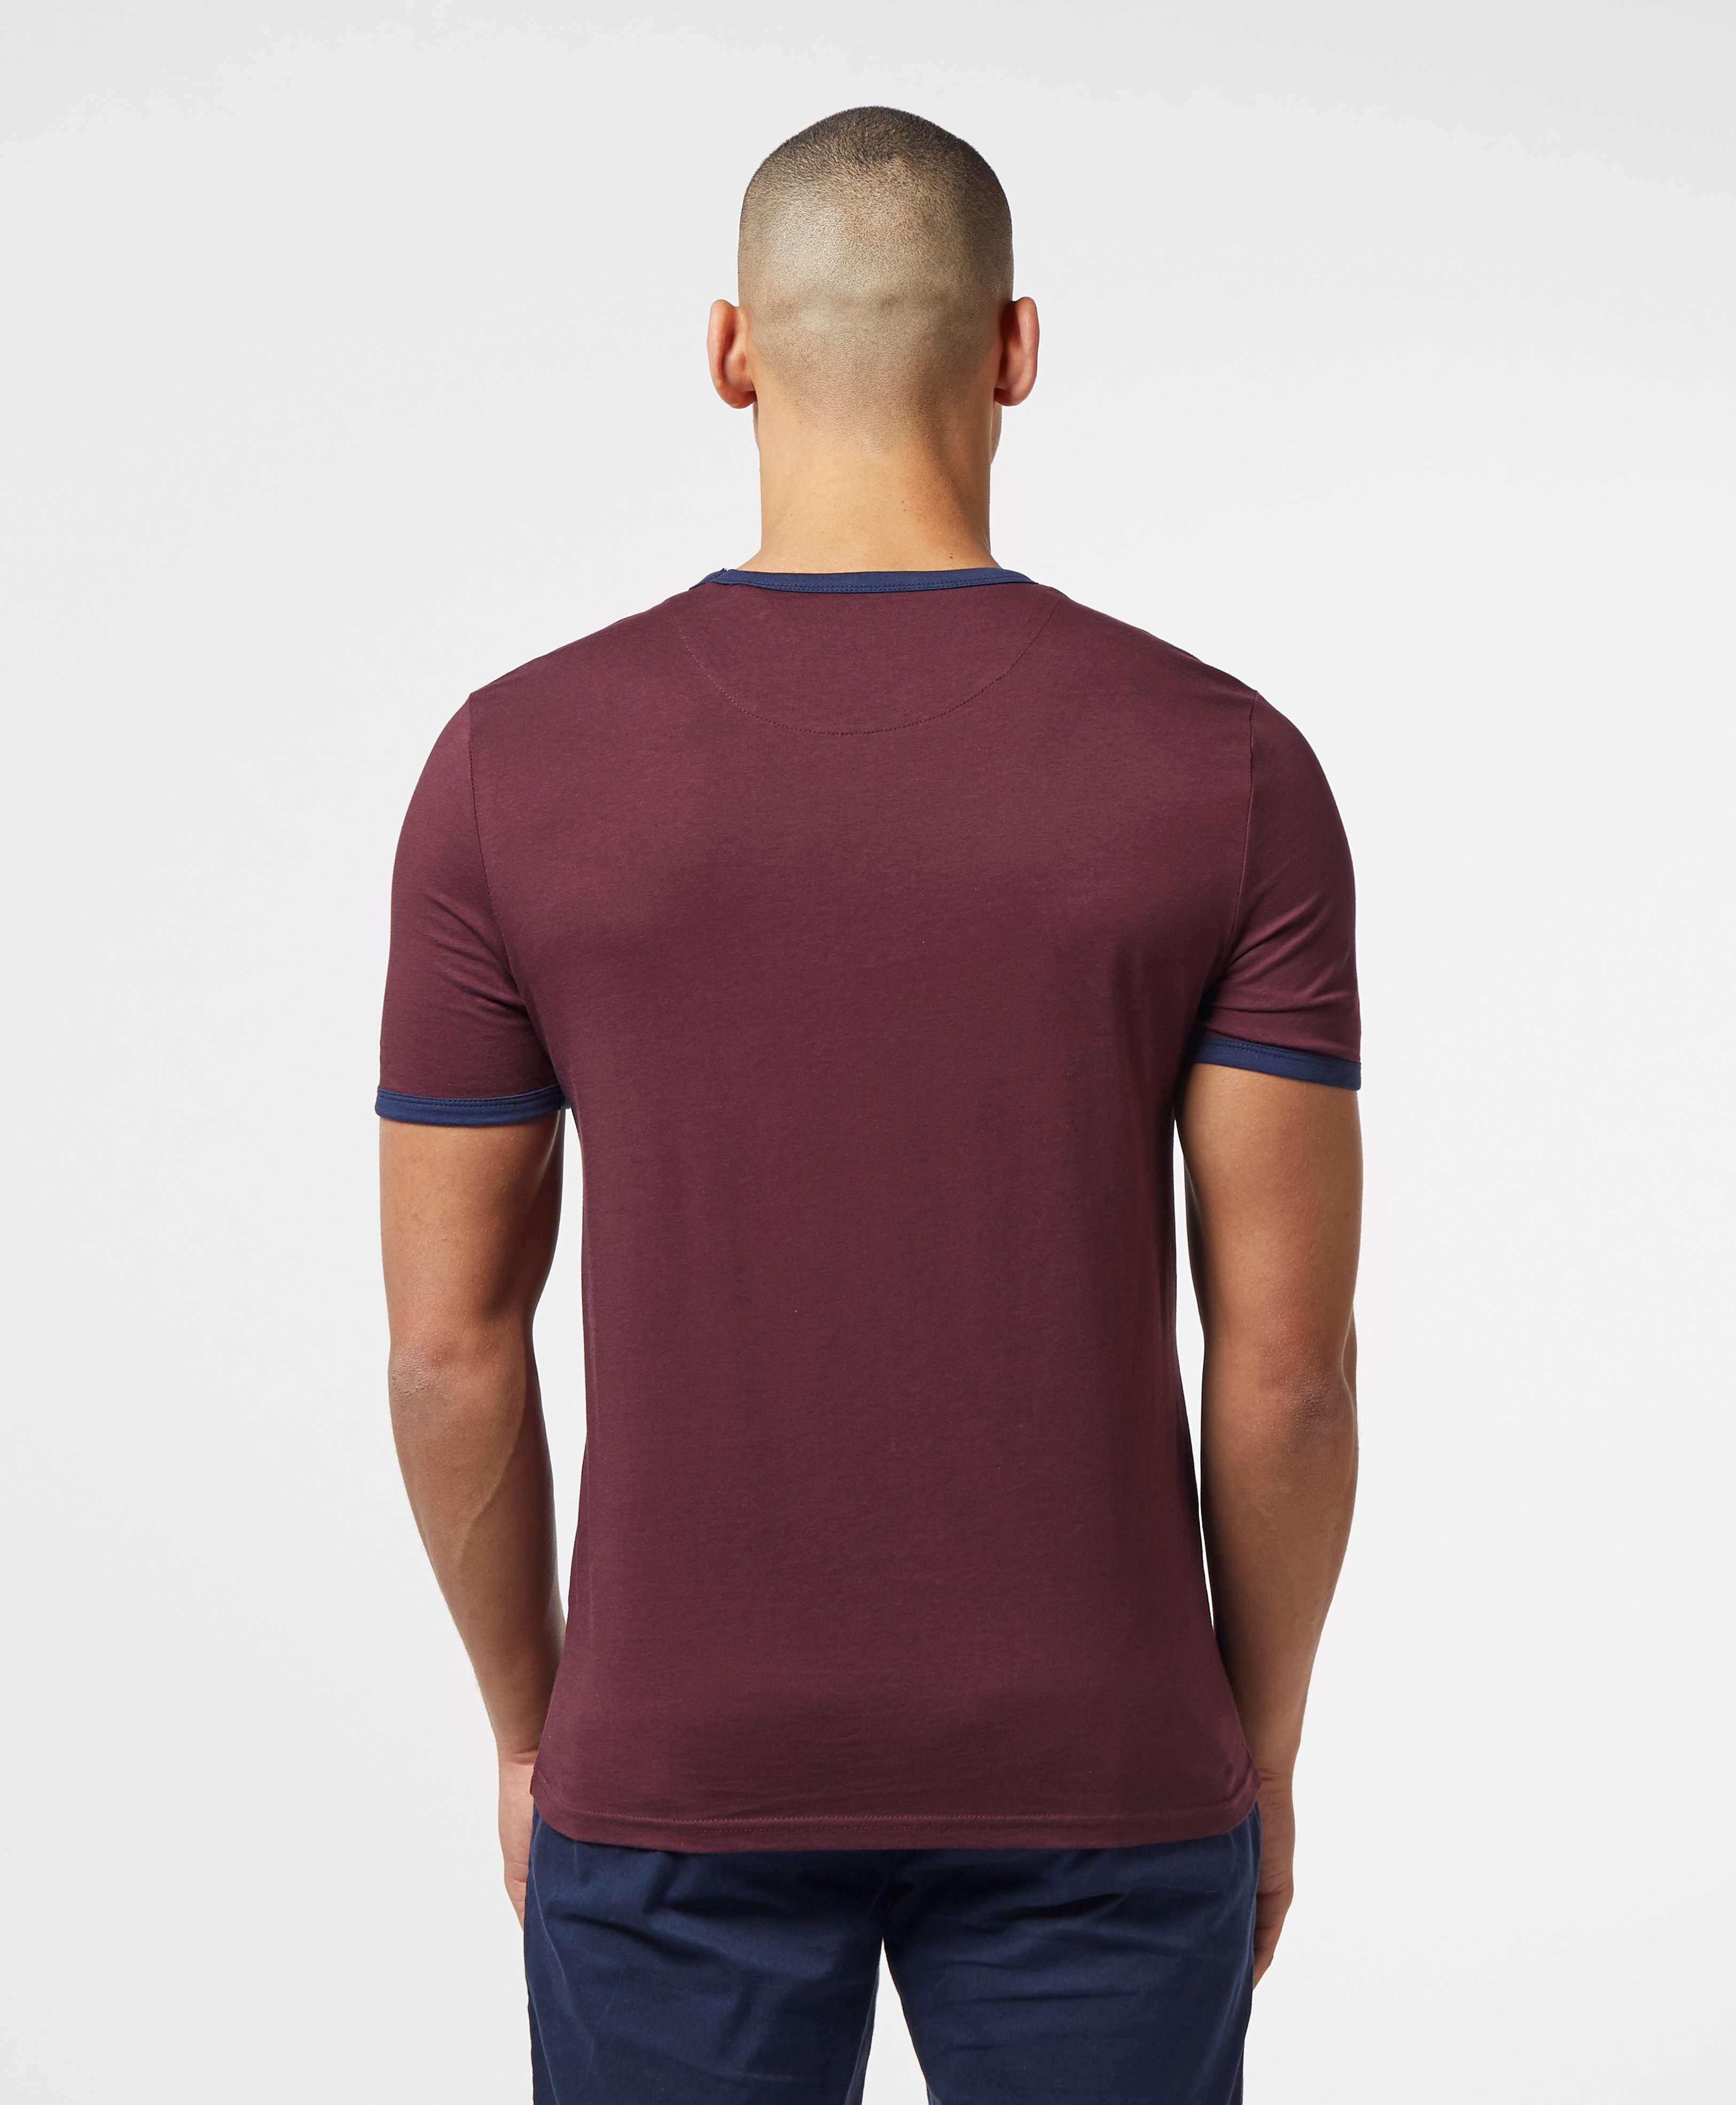 Lyle & Scott Short Sleeve Ringer T-Shirt - Online Exclusive